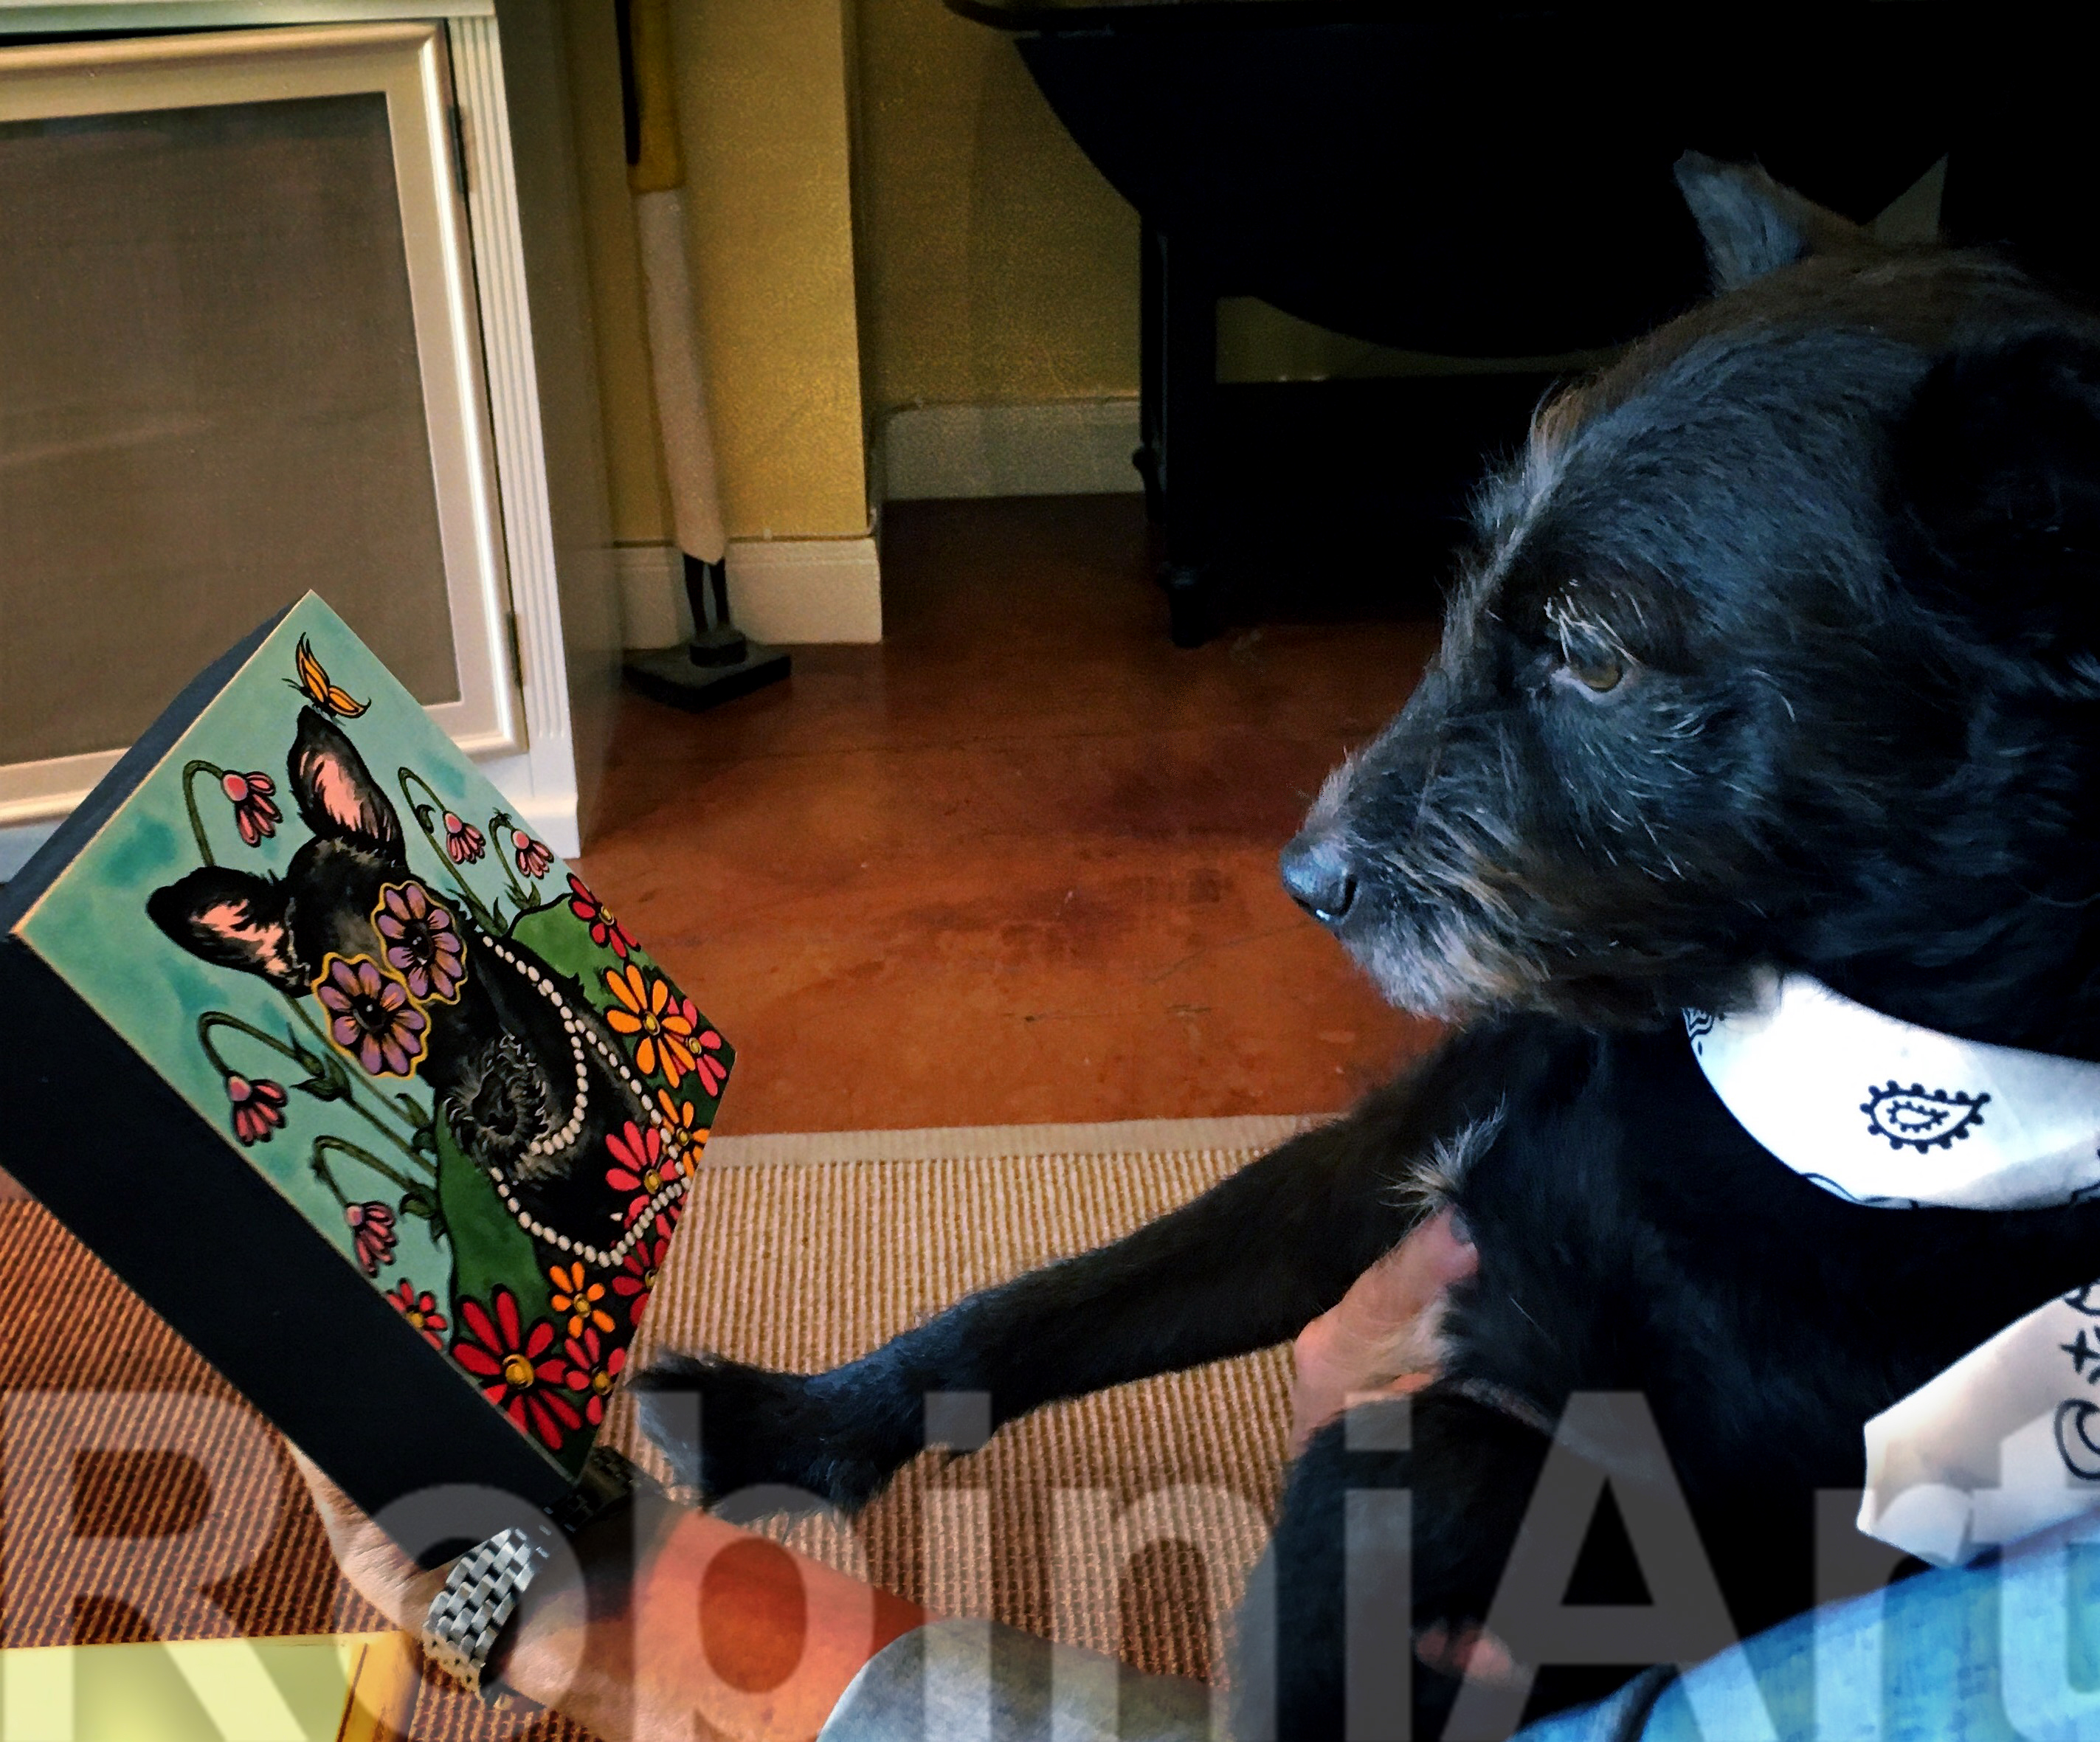 Pet Portrait of a Terrier by Robin Arthur of RobiniArt